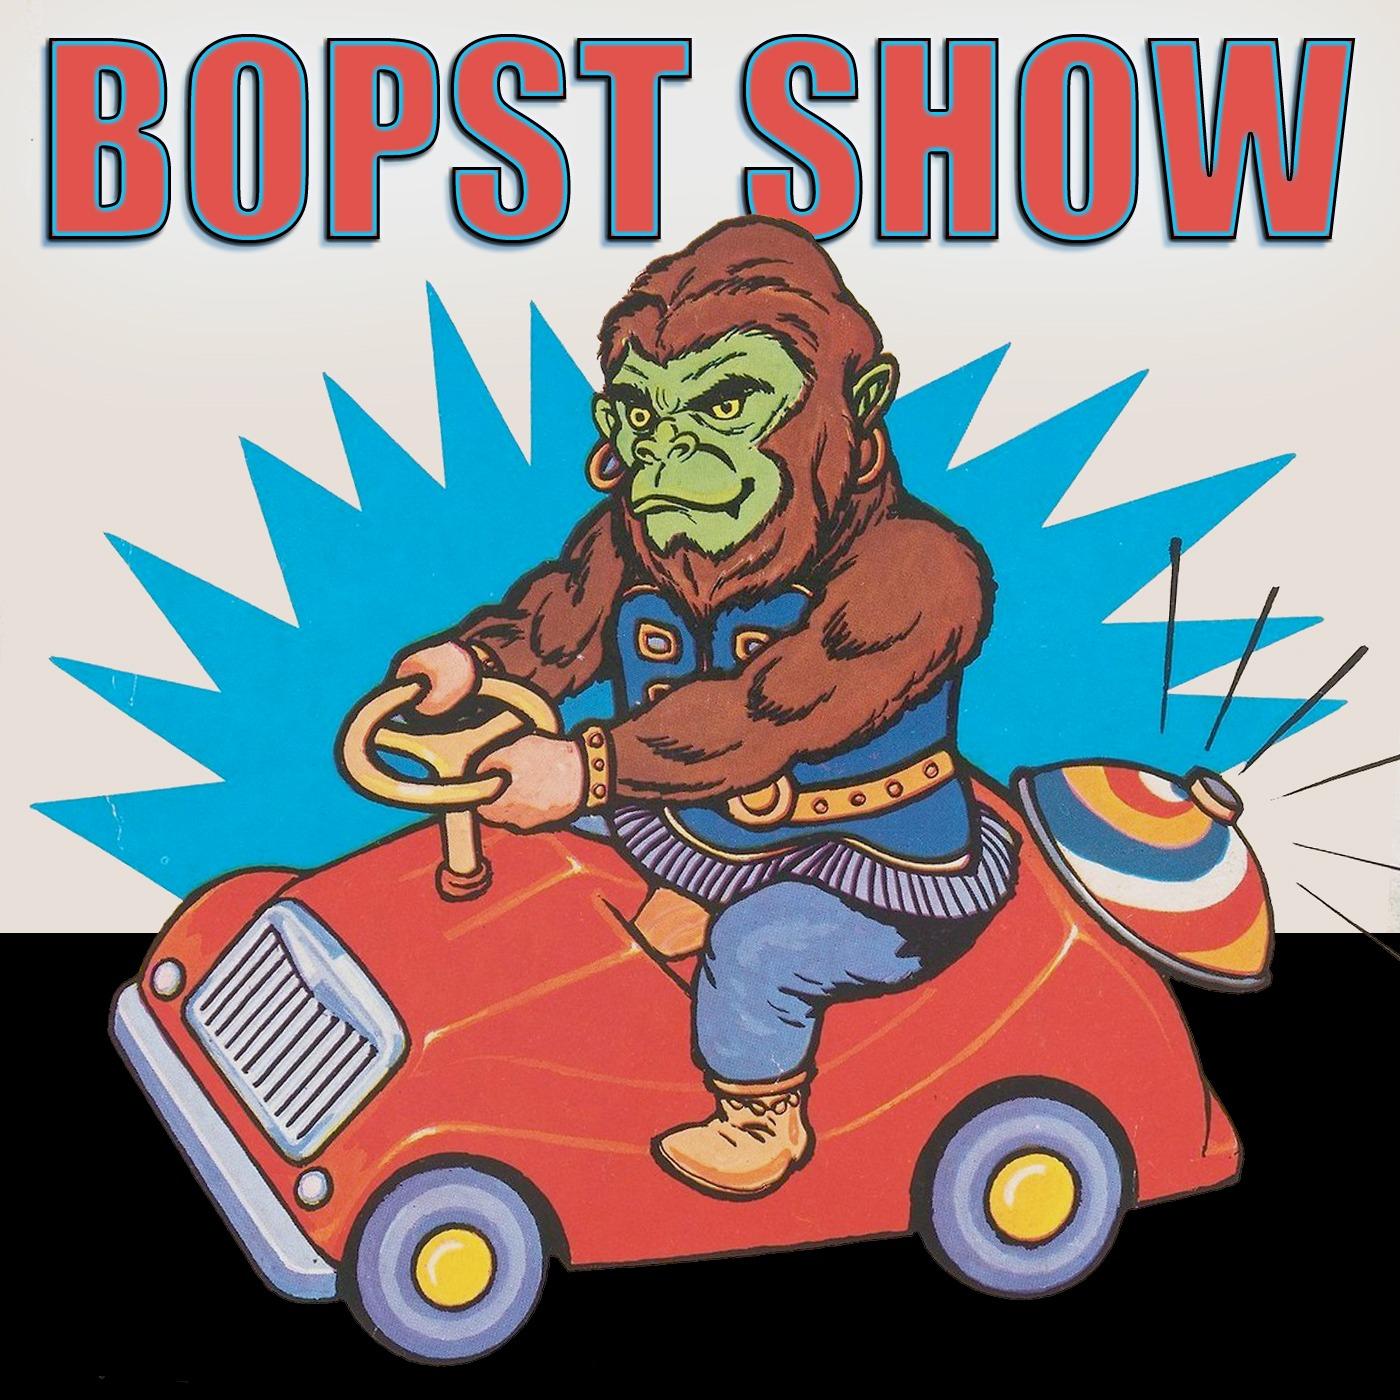 Bopst Show Jammy Wiring Tractor Lights 1400x1400 12958462